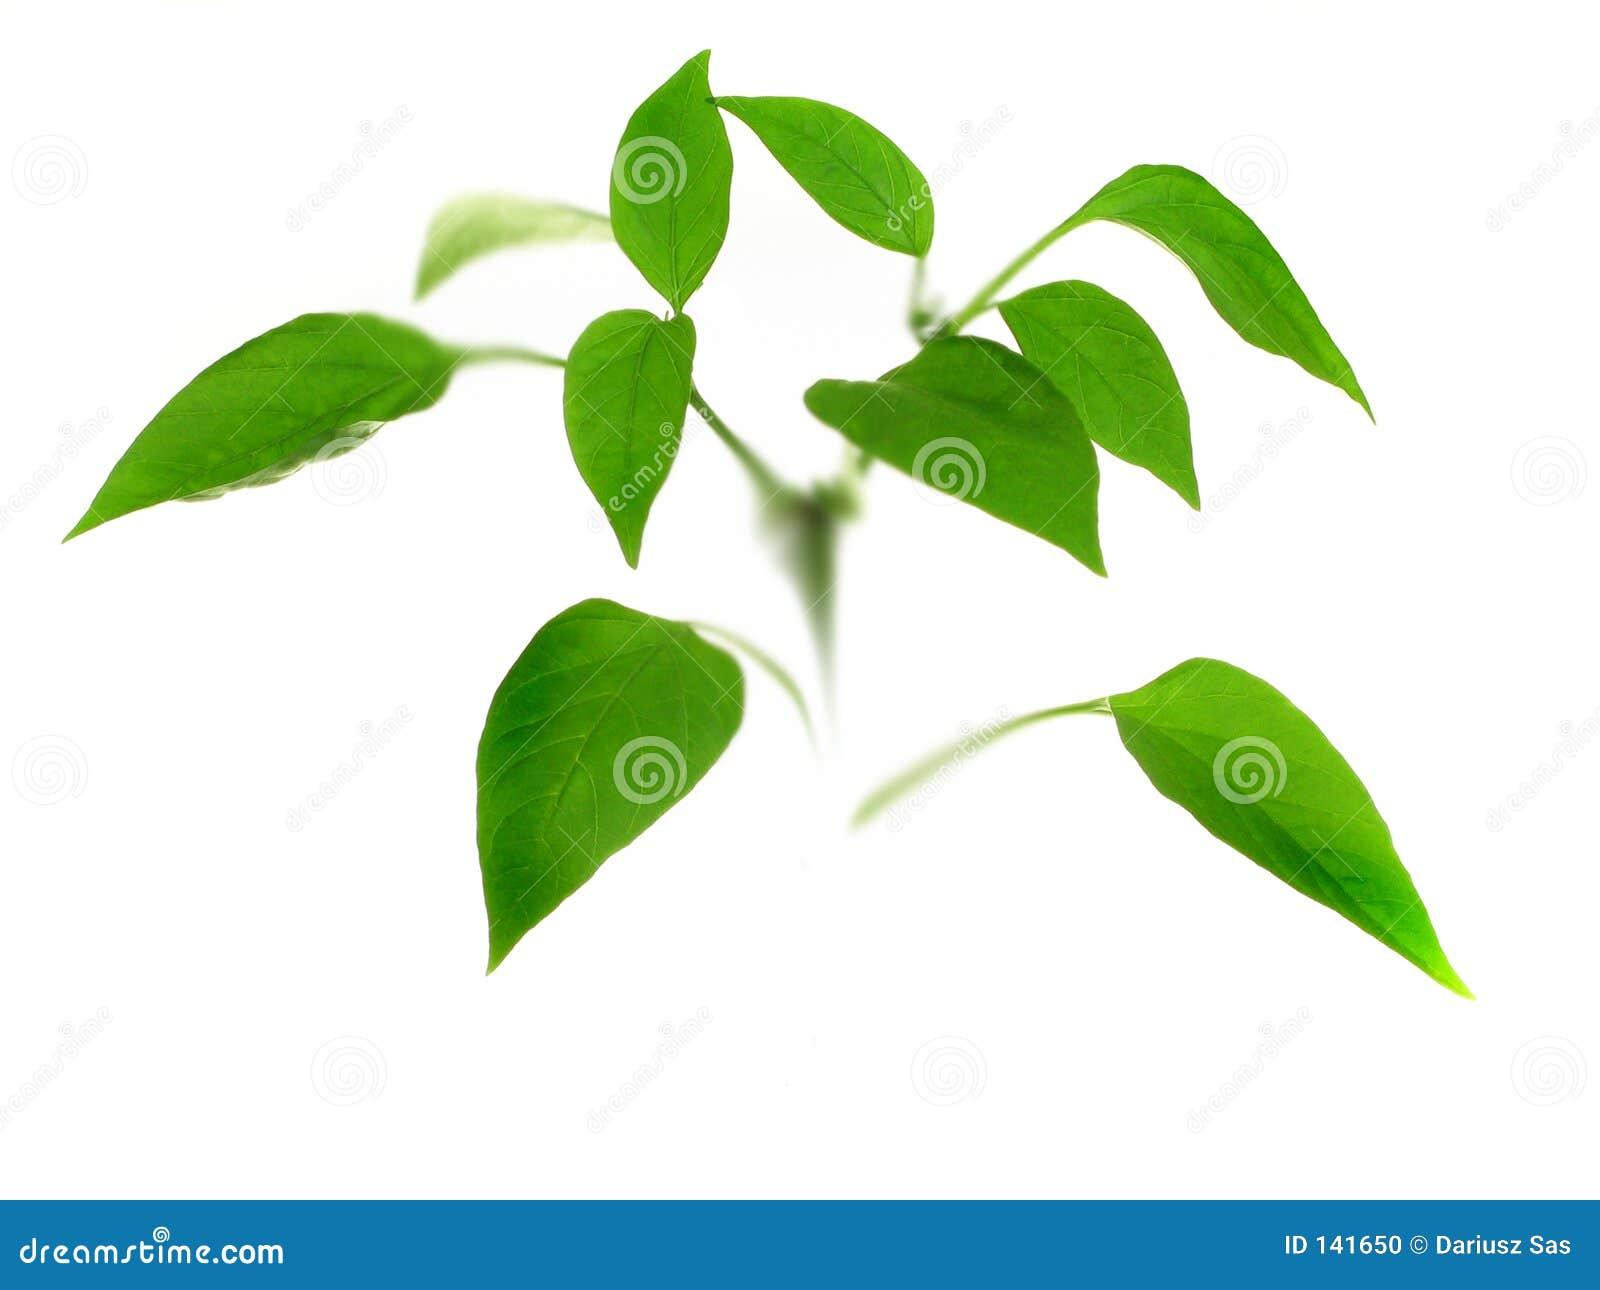 Small Plant Stock Photo Image 141650